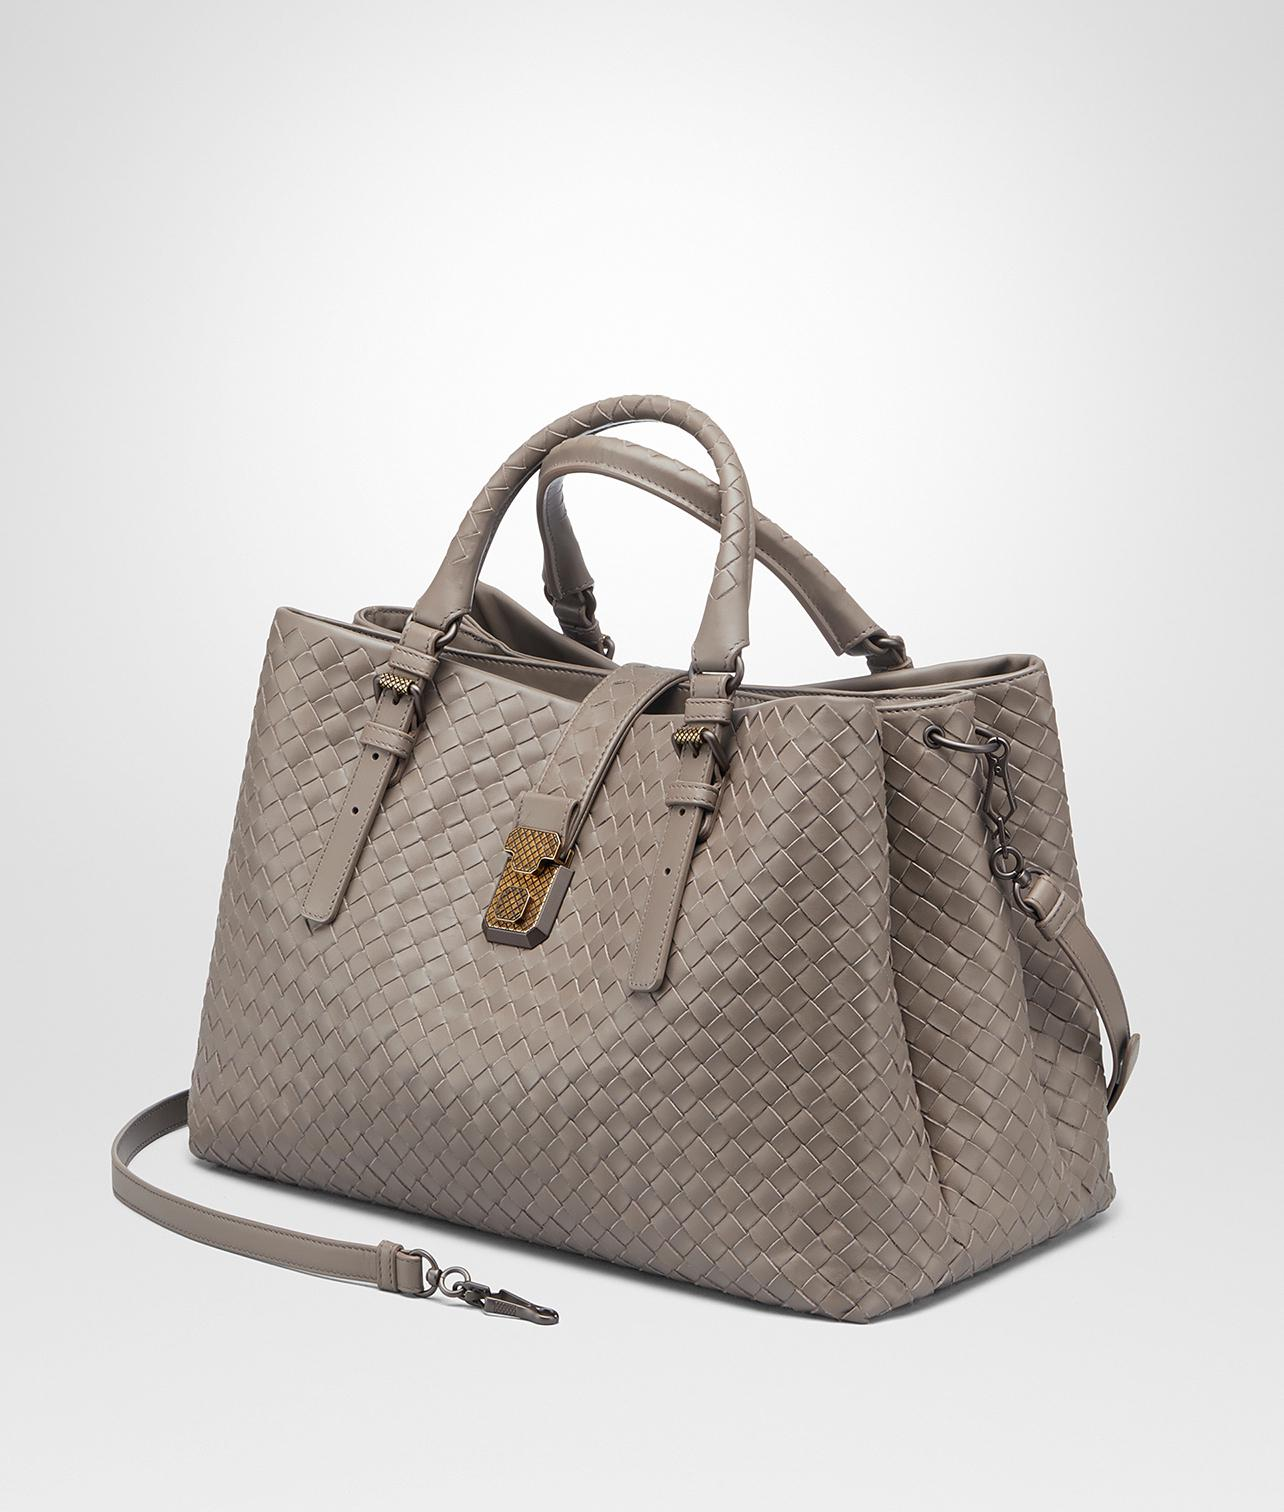 11a77d623cc9 Bottega Veneta Steel Intrecciato Calf Medium Roma Bag in Gray - Lyst